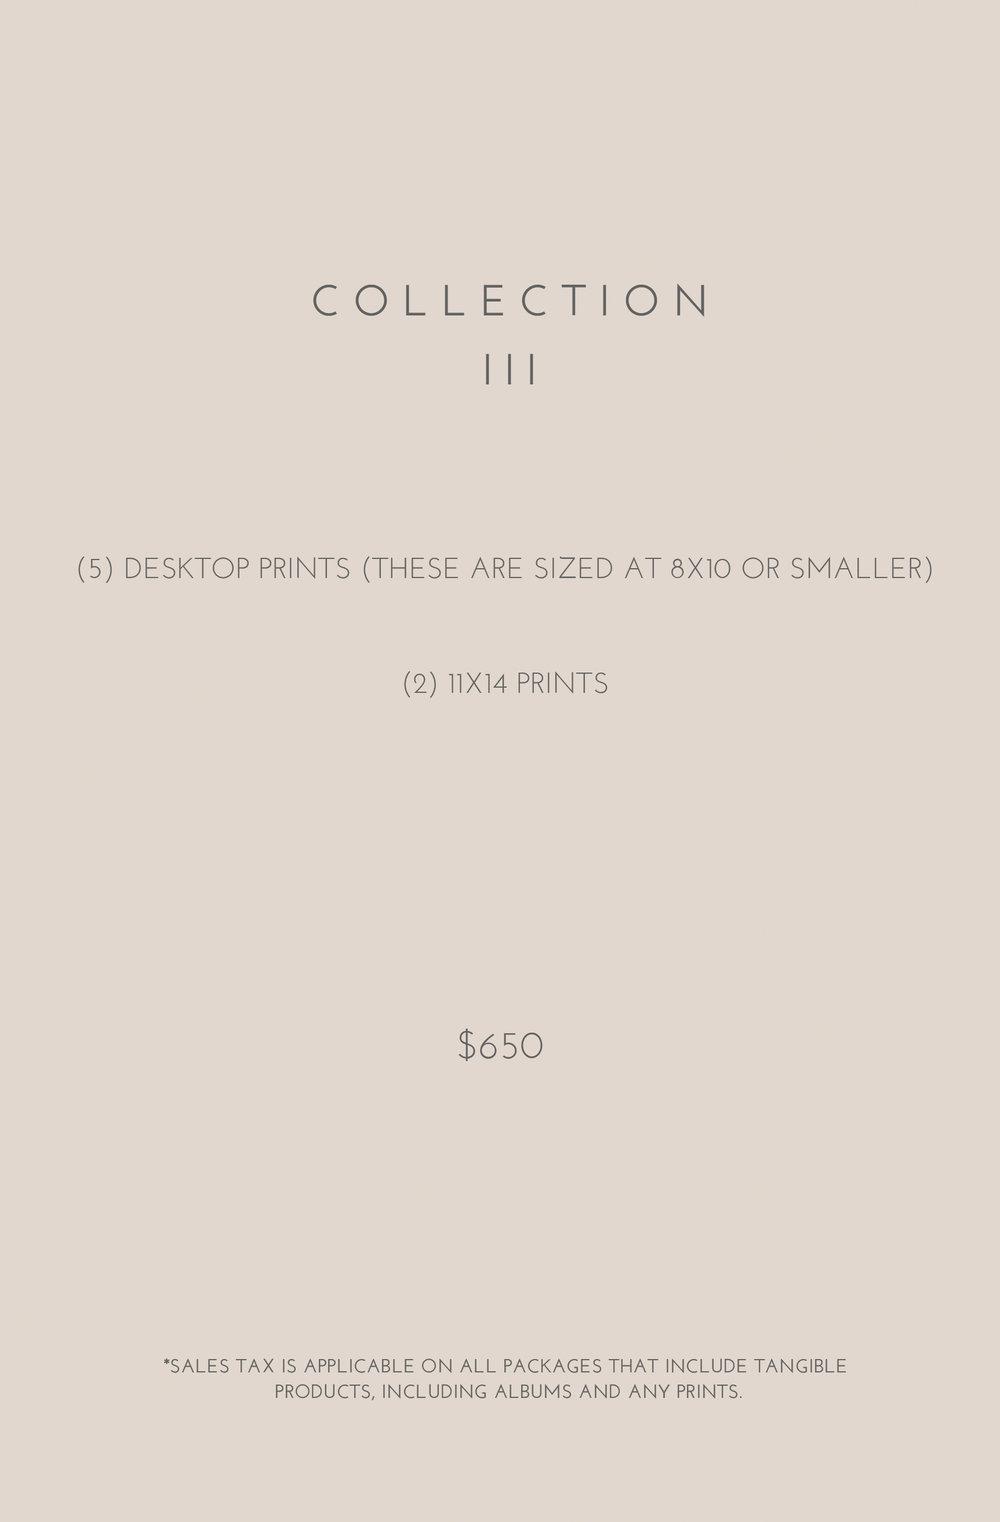 collectionIII.jpg